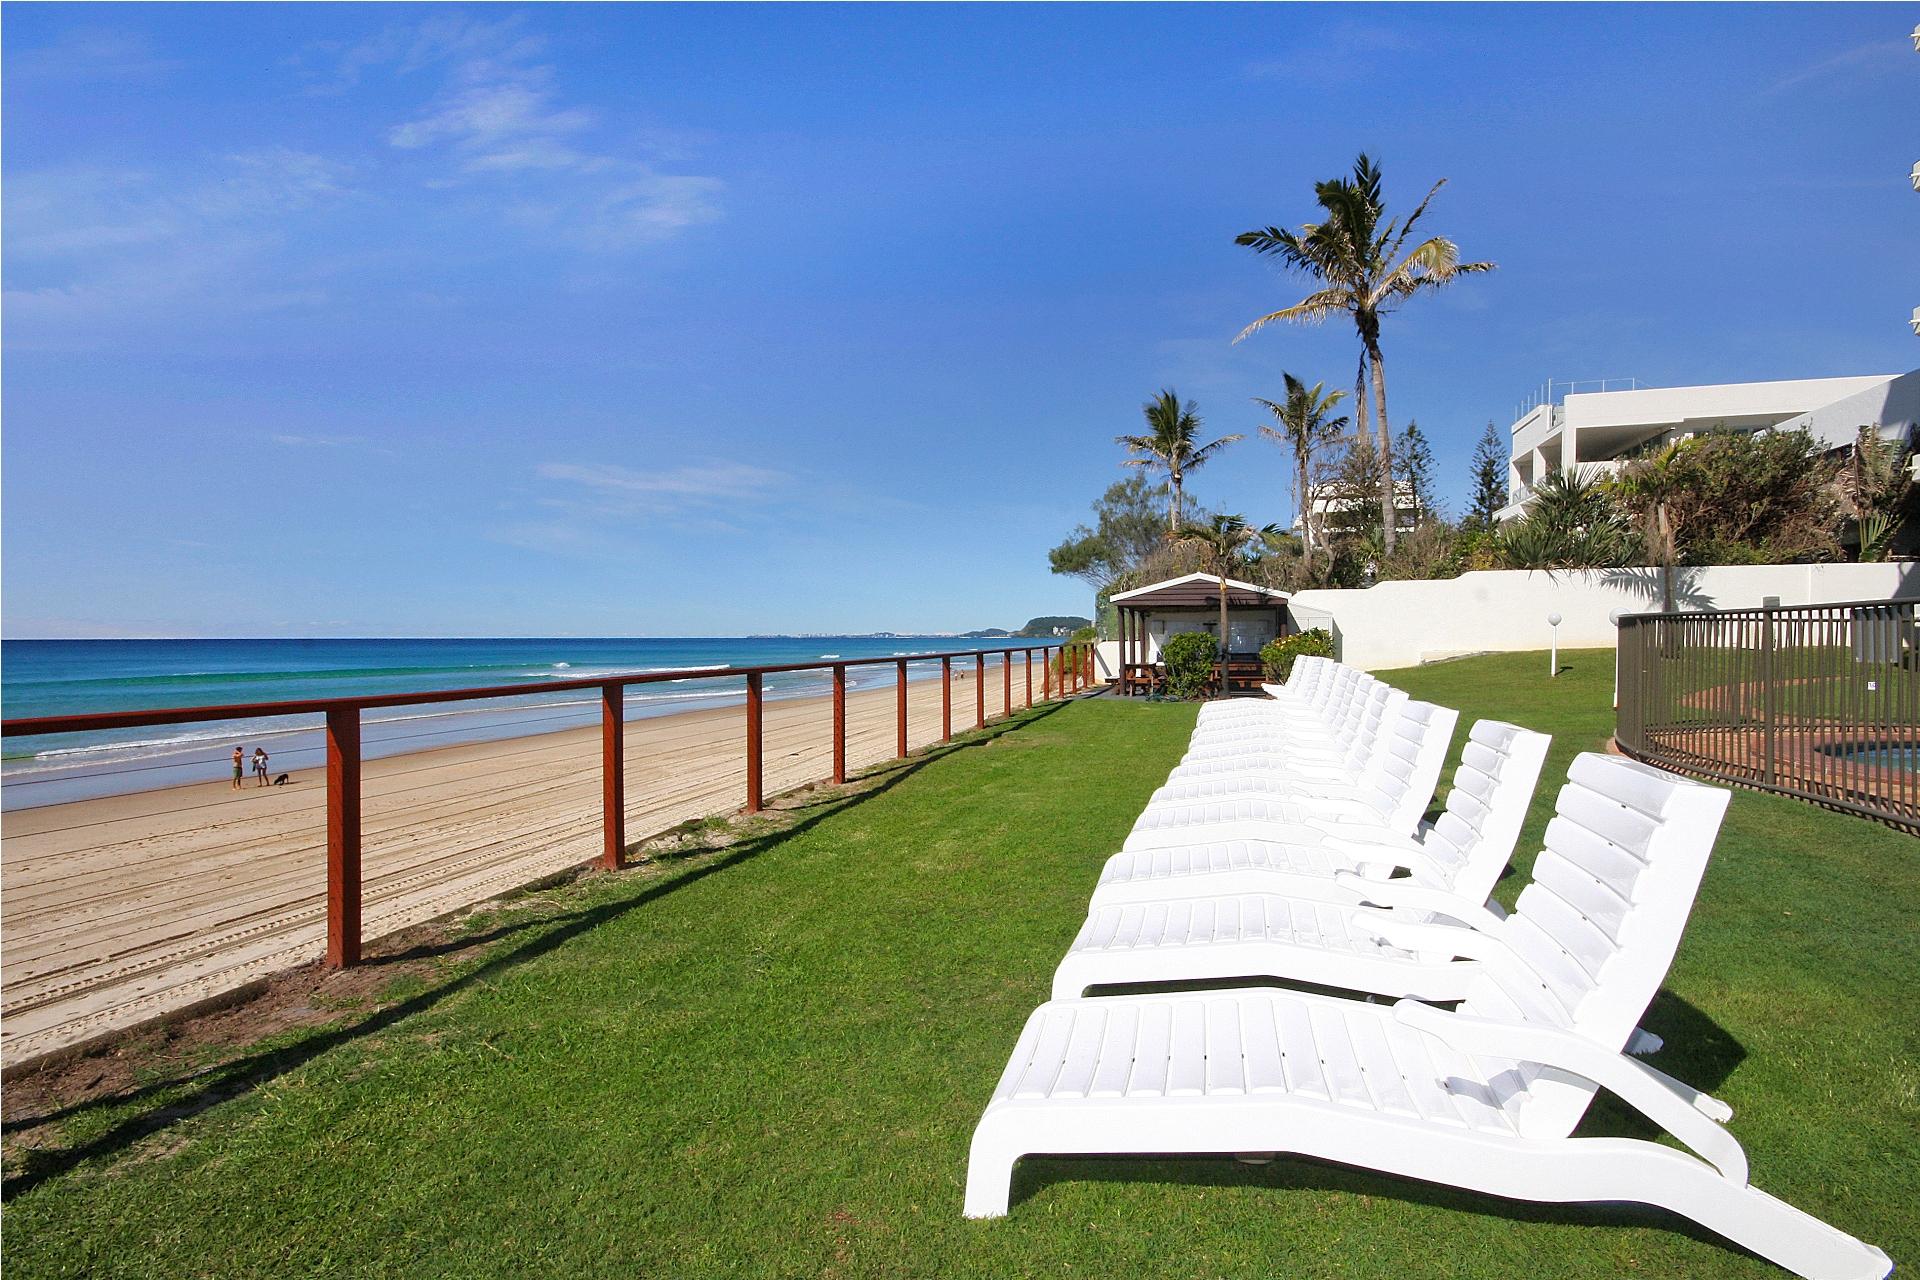 Sun Lounges overlooking the beach & ocean